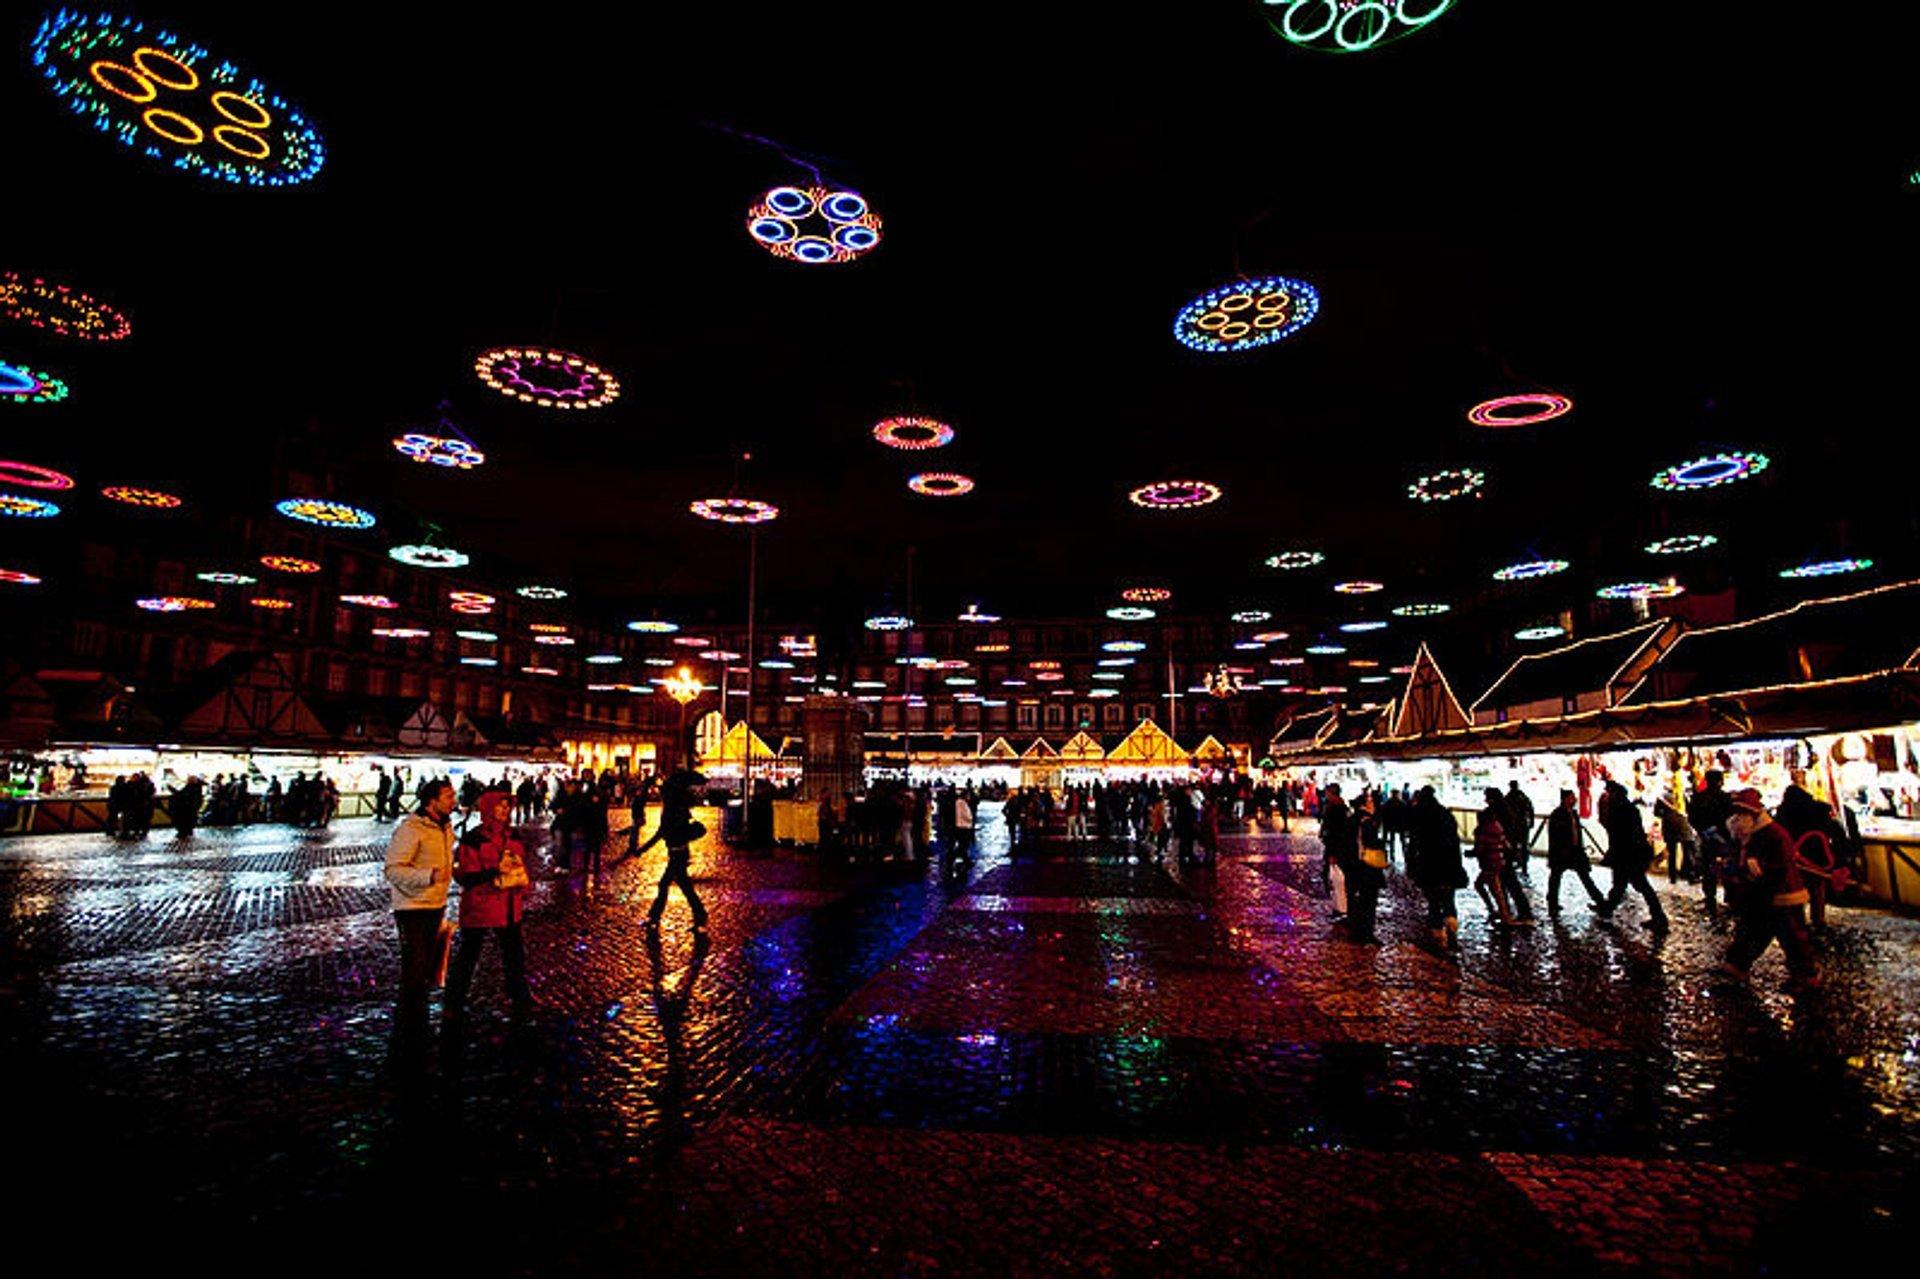 Plaza Mayor Mercado de Navidad at night with Christmas illumination 2020